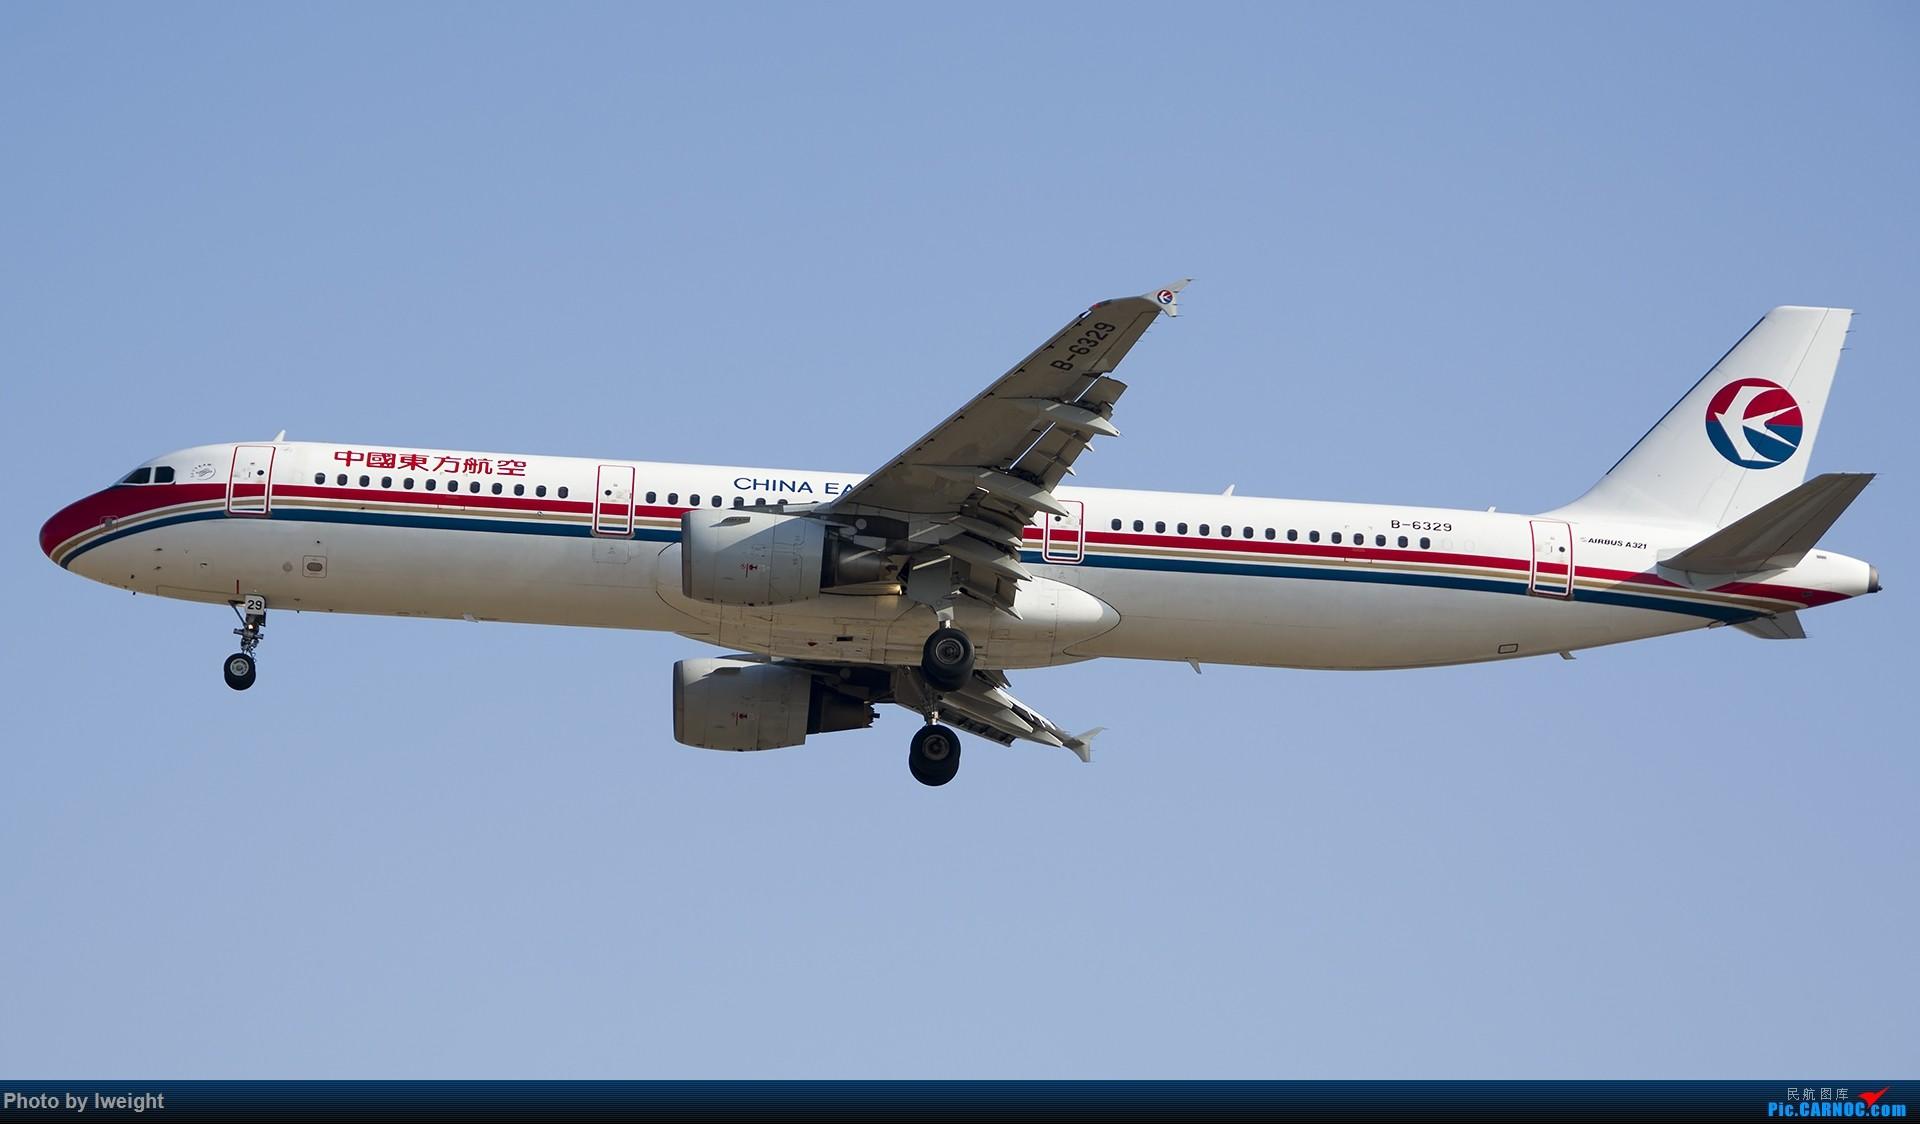 Re:[原创]庆祝升级777,发上今天在首都机场拍的所有飞机【2014-12-14】 AIRBUS A321-200 B-6329 中国北京首都国际机场